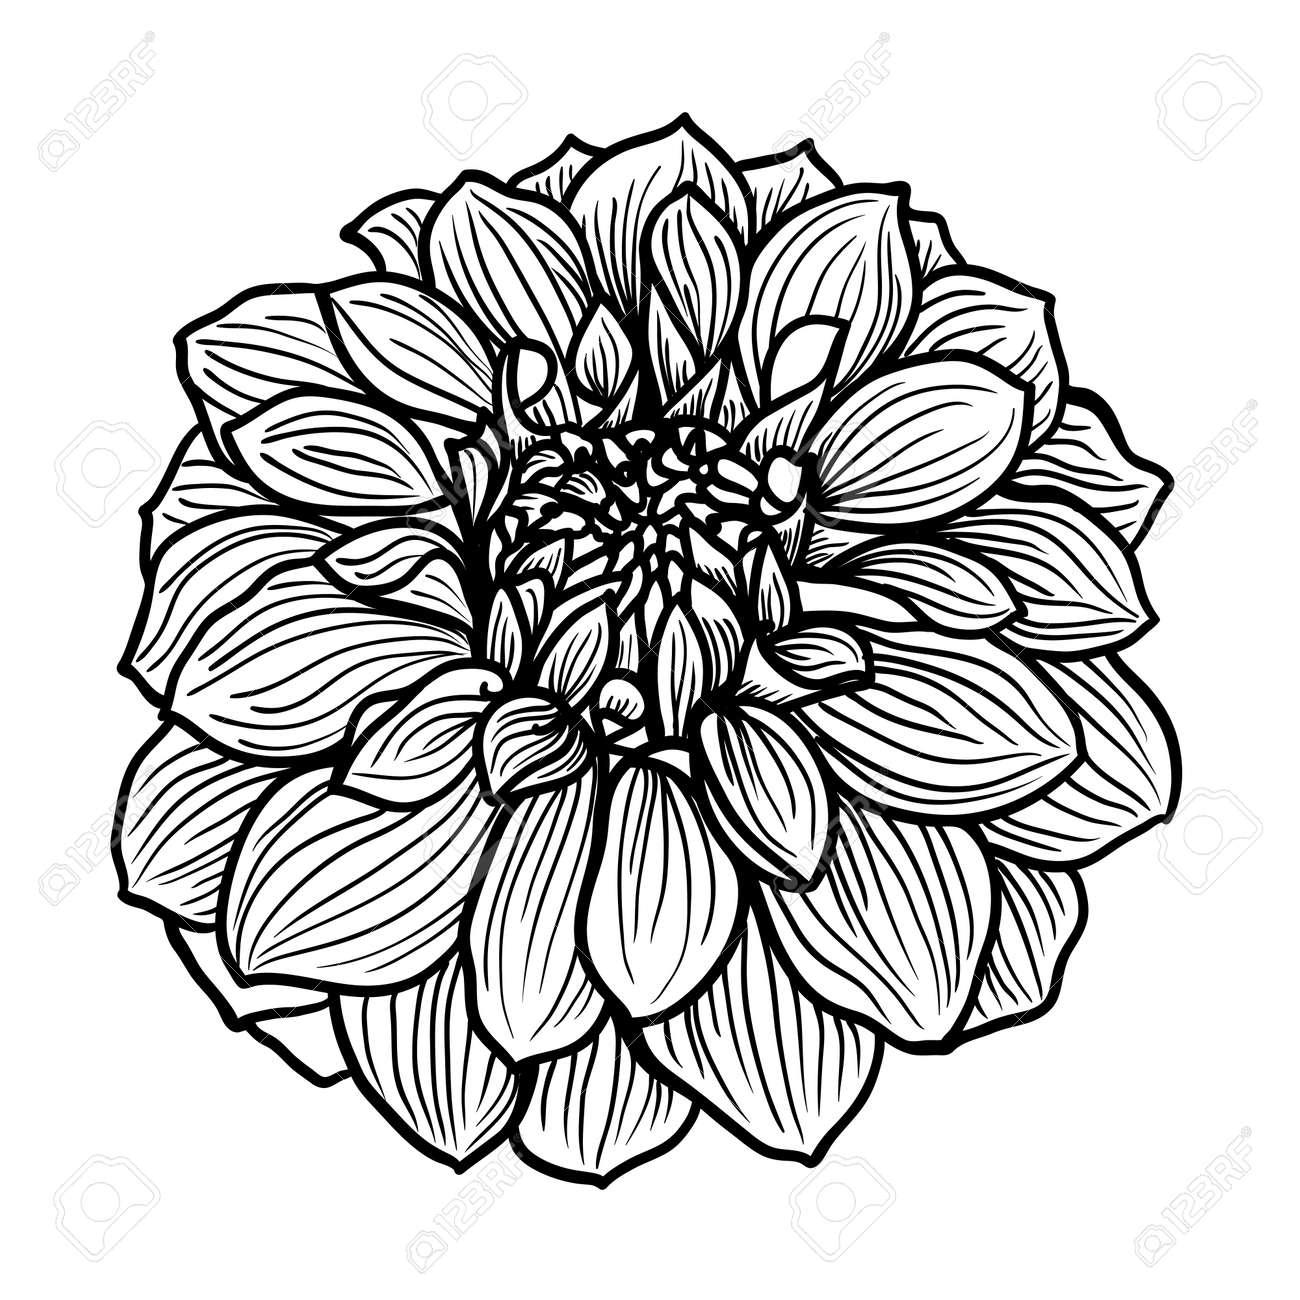 Hand Drawn Dahlia Flower Black And White Vector Illustration